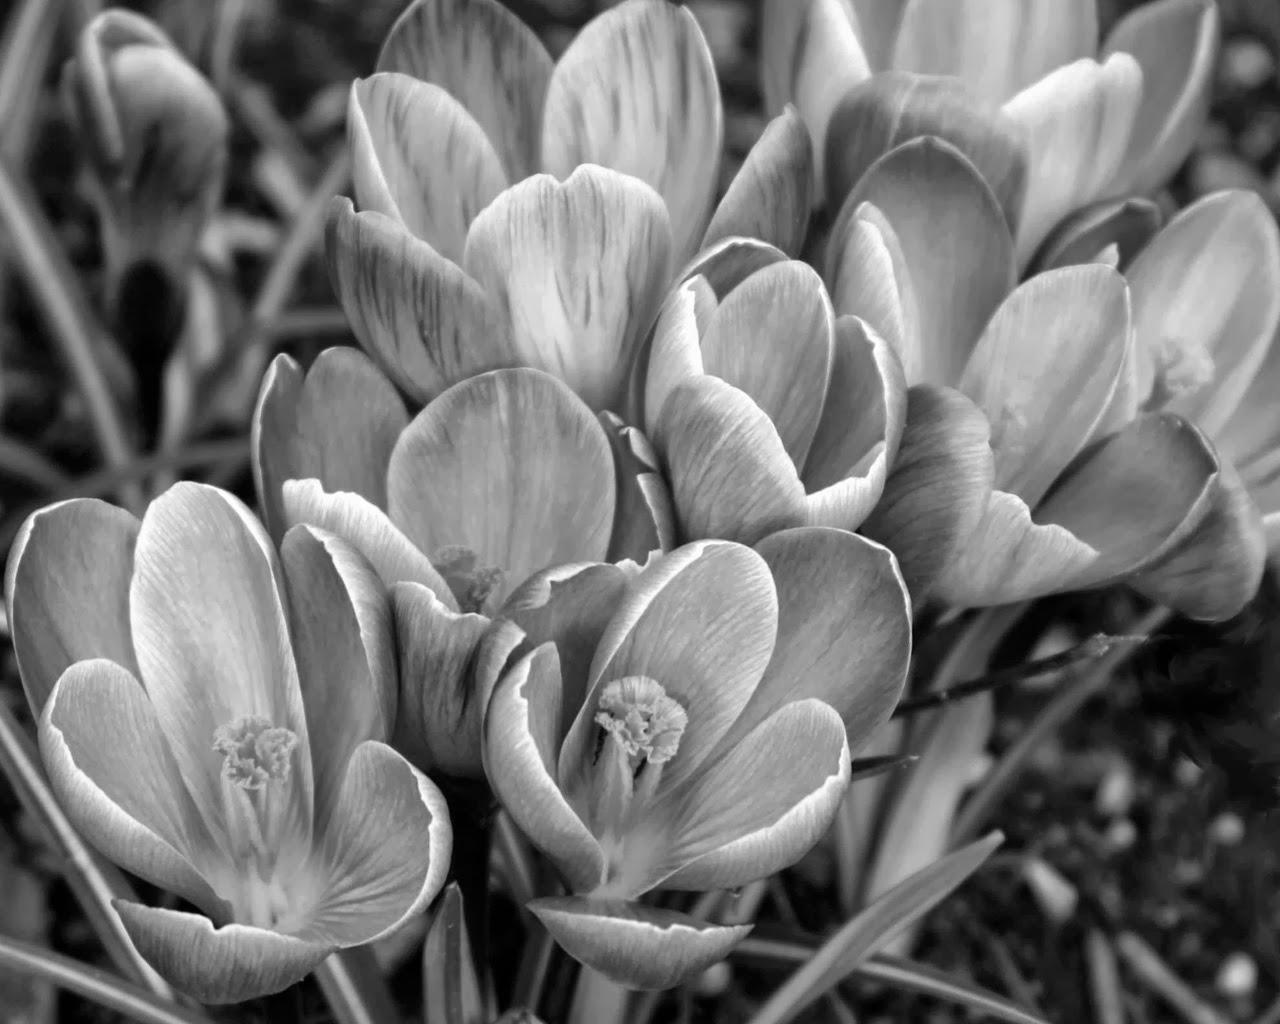 Красивые чёрно-белые фотографии ...: www.foksit.ru/2013/10/Chjorno-belye-fotografii-cvetov.html